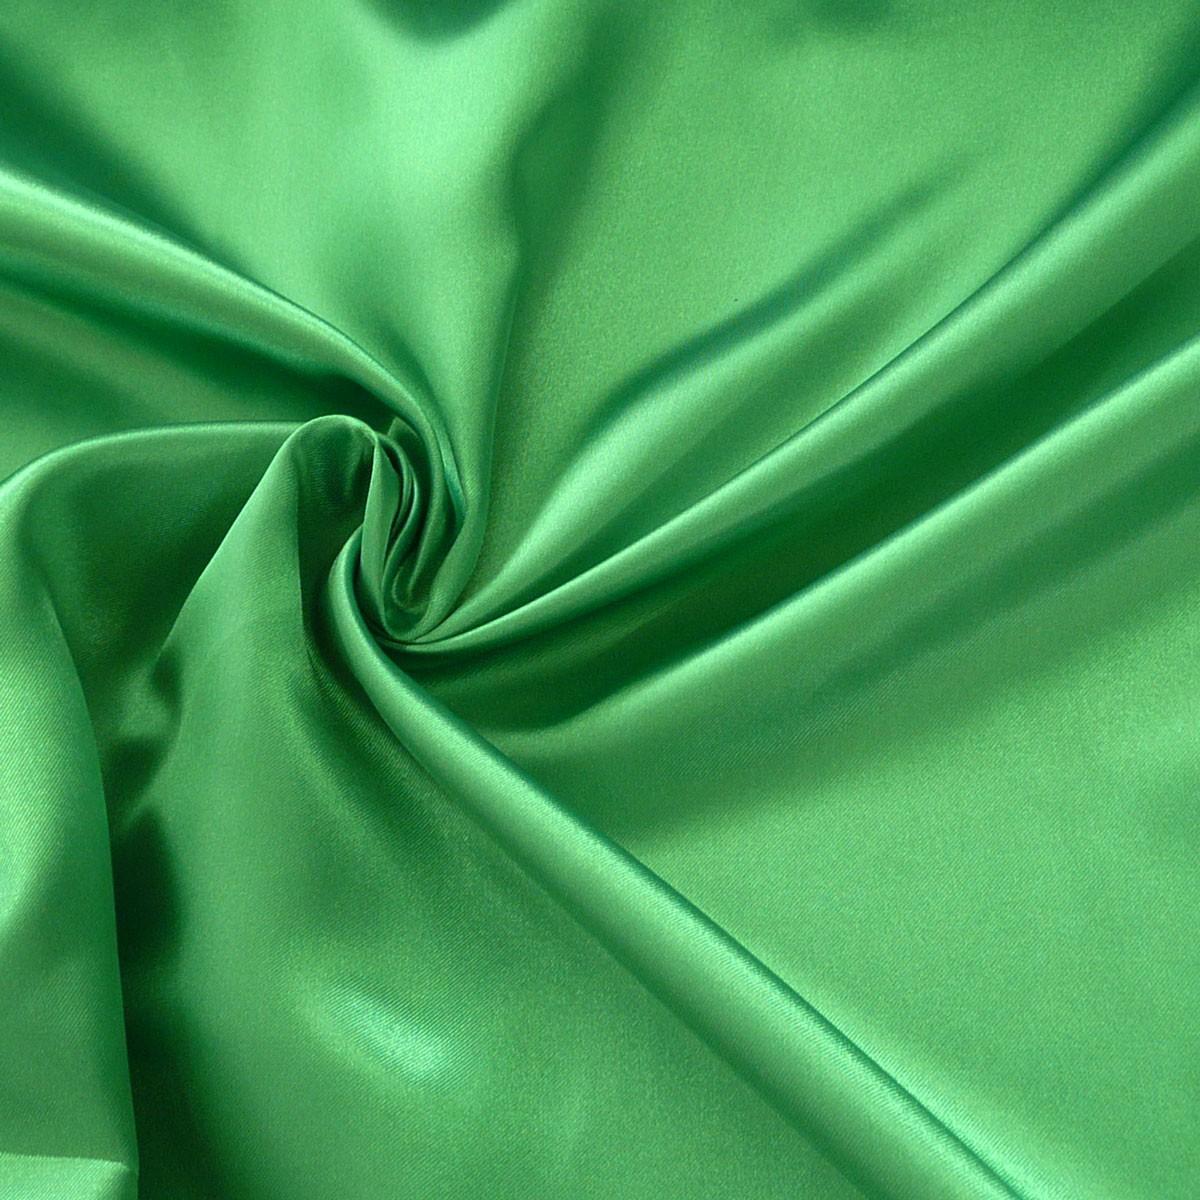 Kreativstoff Satinstoff einfarbig grasgrün 1,4m Breite